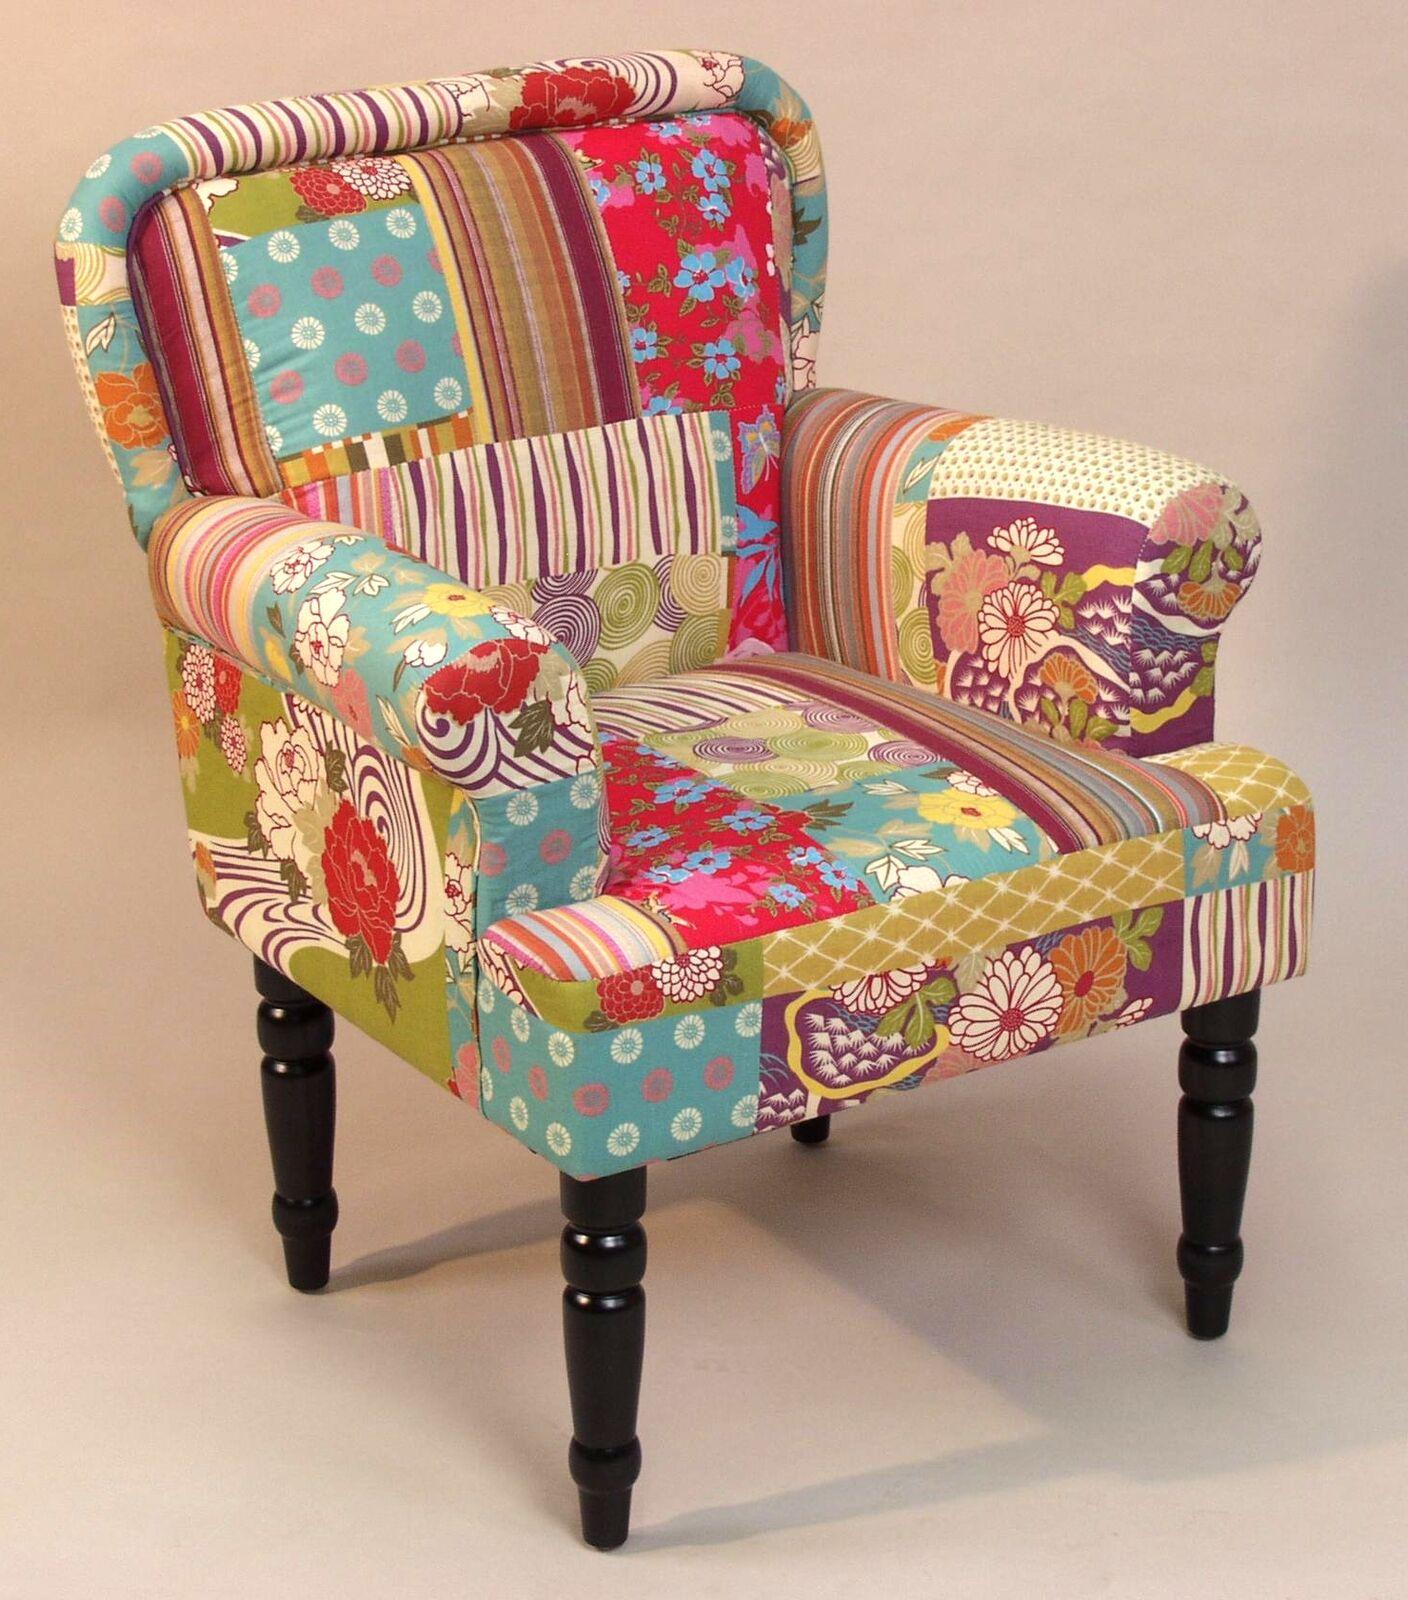 moderner sessel polstersessel bunt club gepolstert patchwork design g nstig neu kaufen bei go. Black Bedroom Furniture Sets. Home Design Ideas